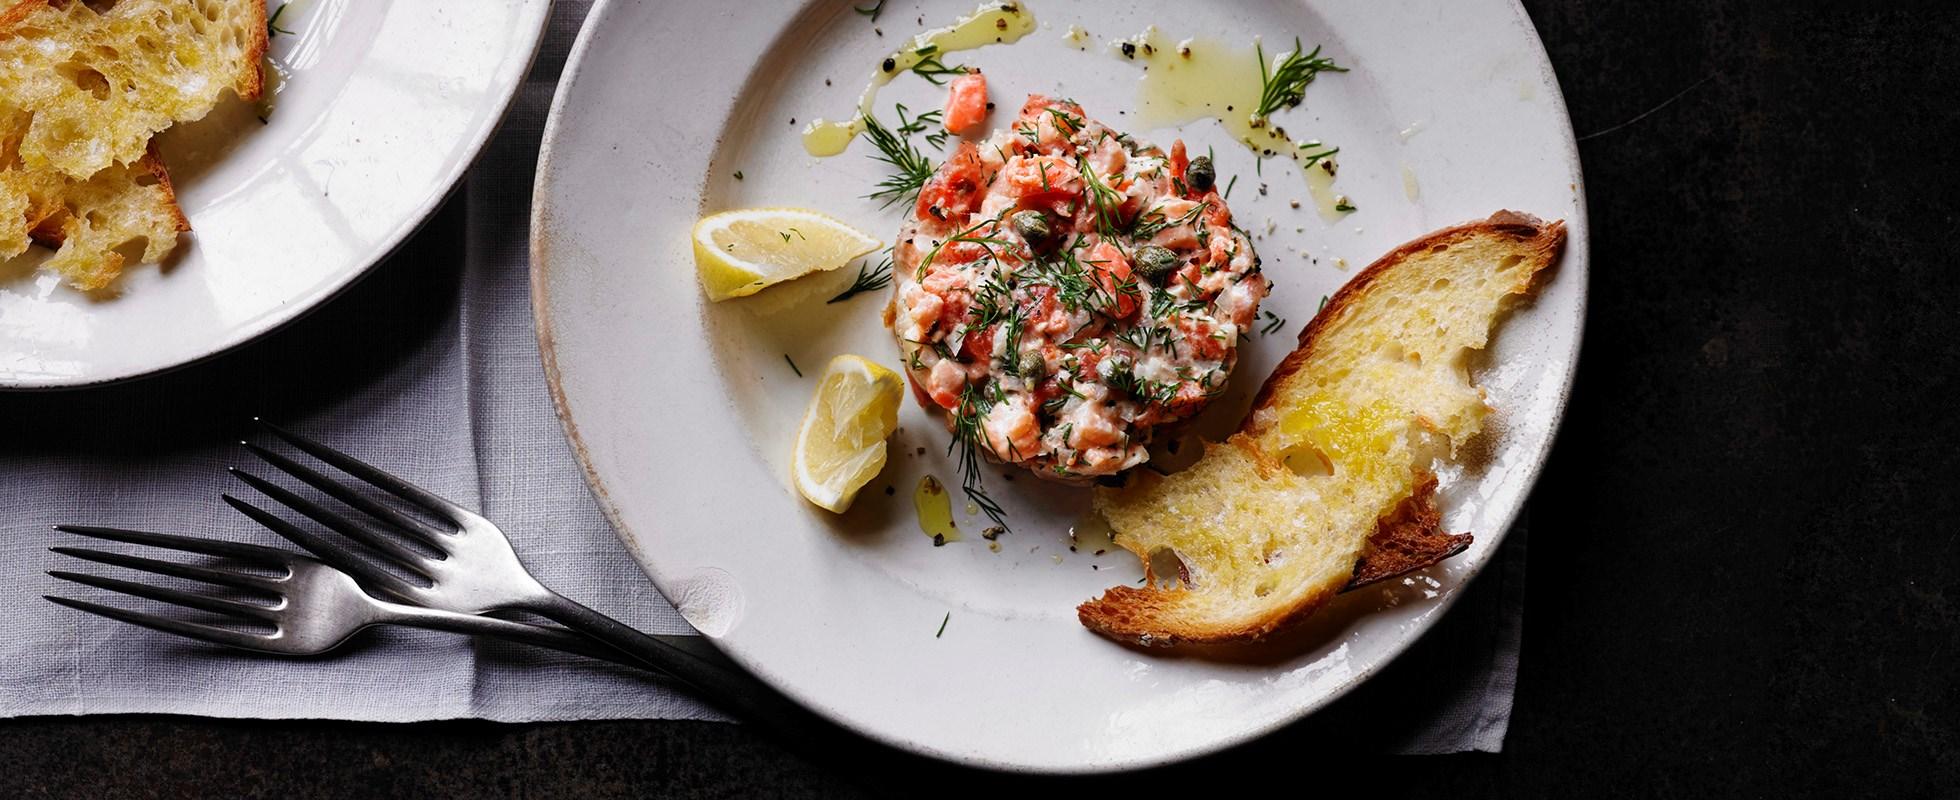 38 Easy Starter Recipes For Dinner Party Starters Olive Magazine